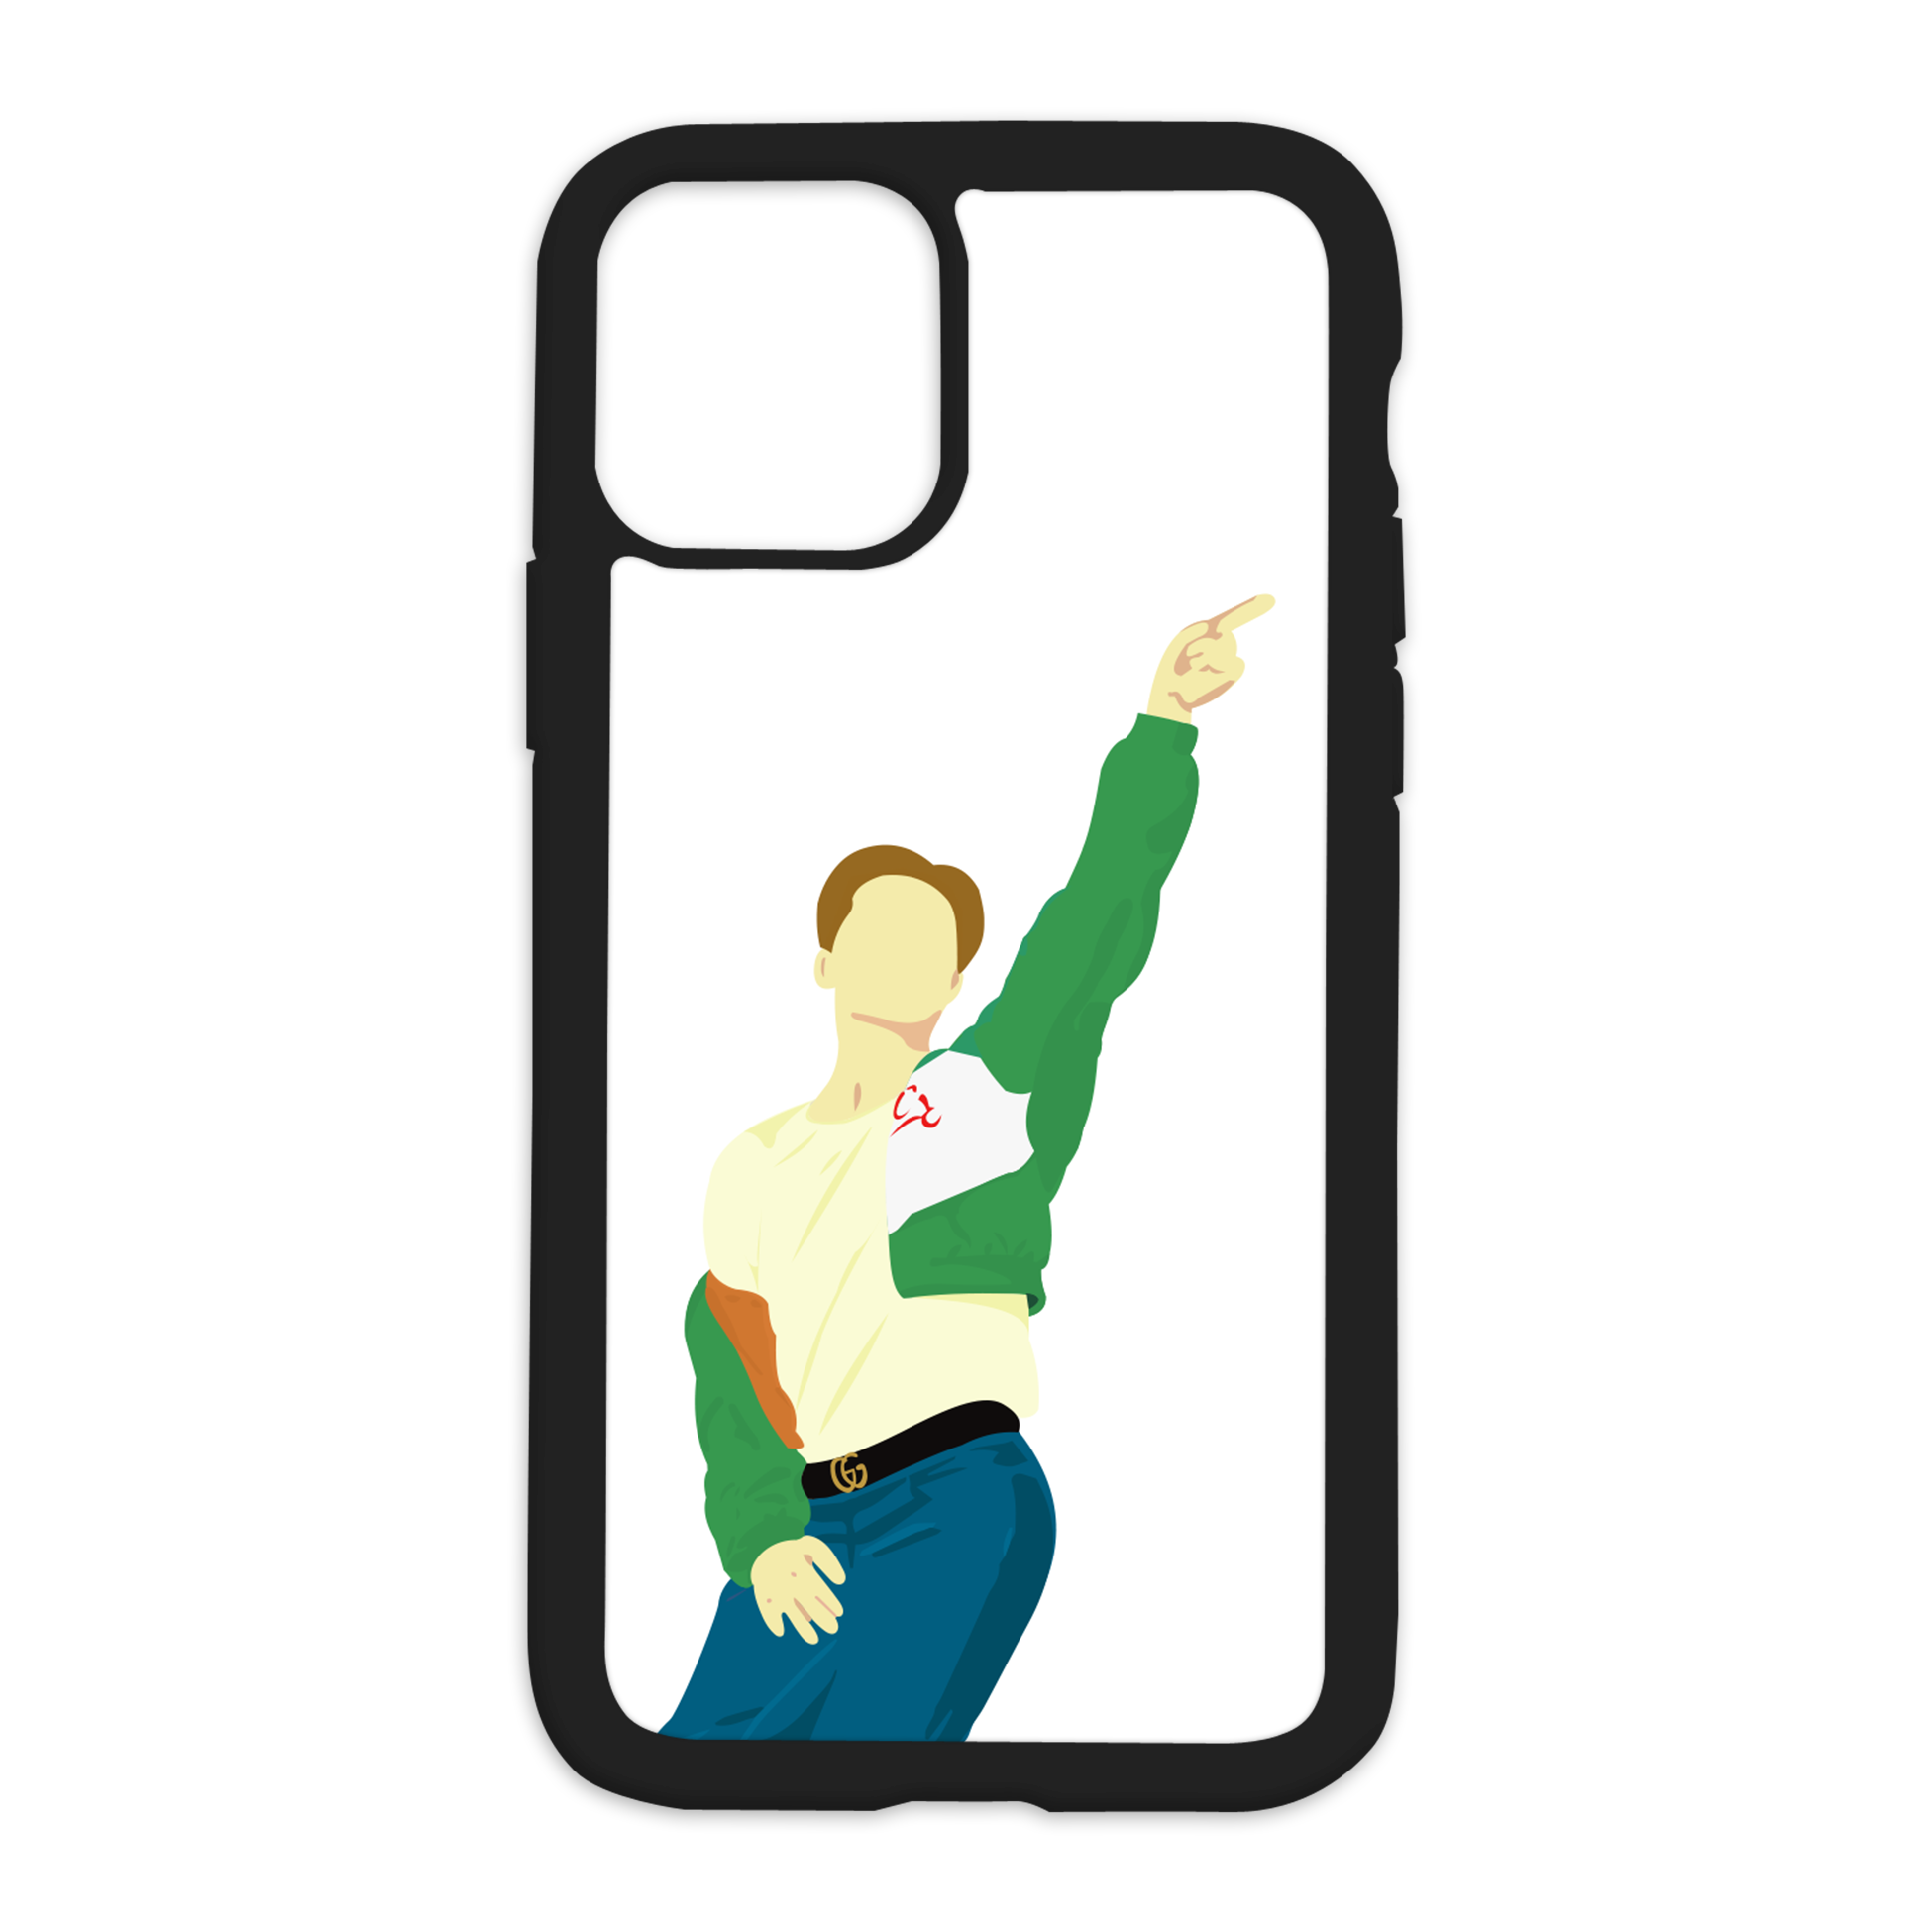 Jimin Dynamite Design On Black Phone Case - 6/6s+